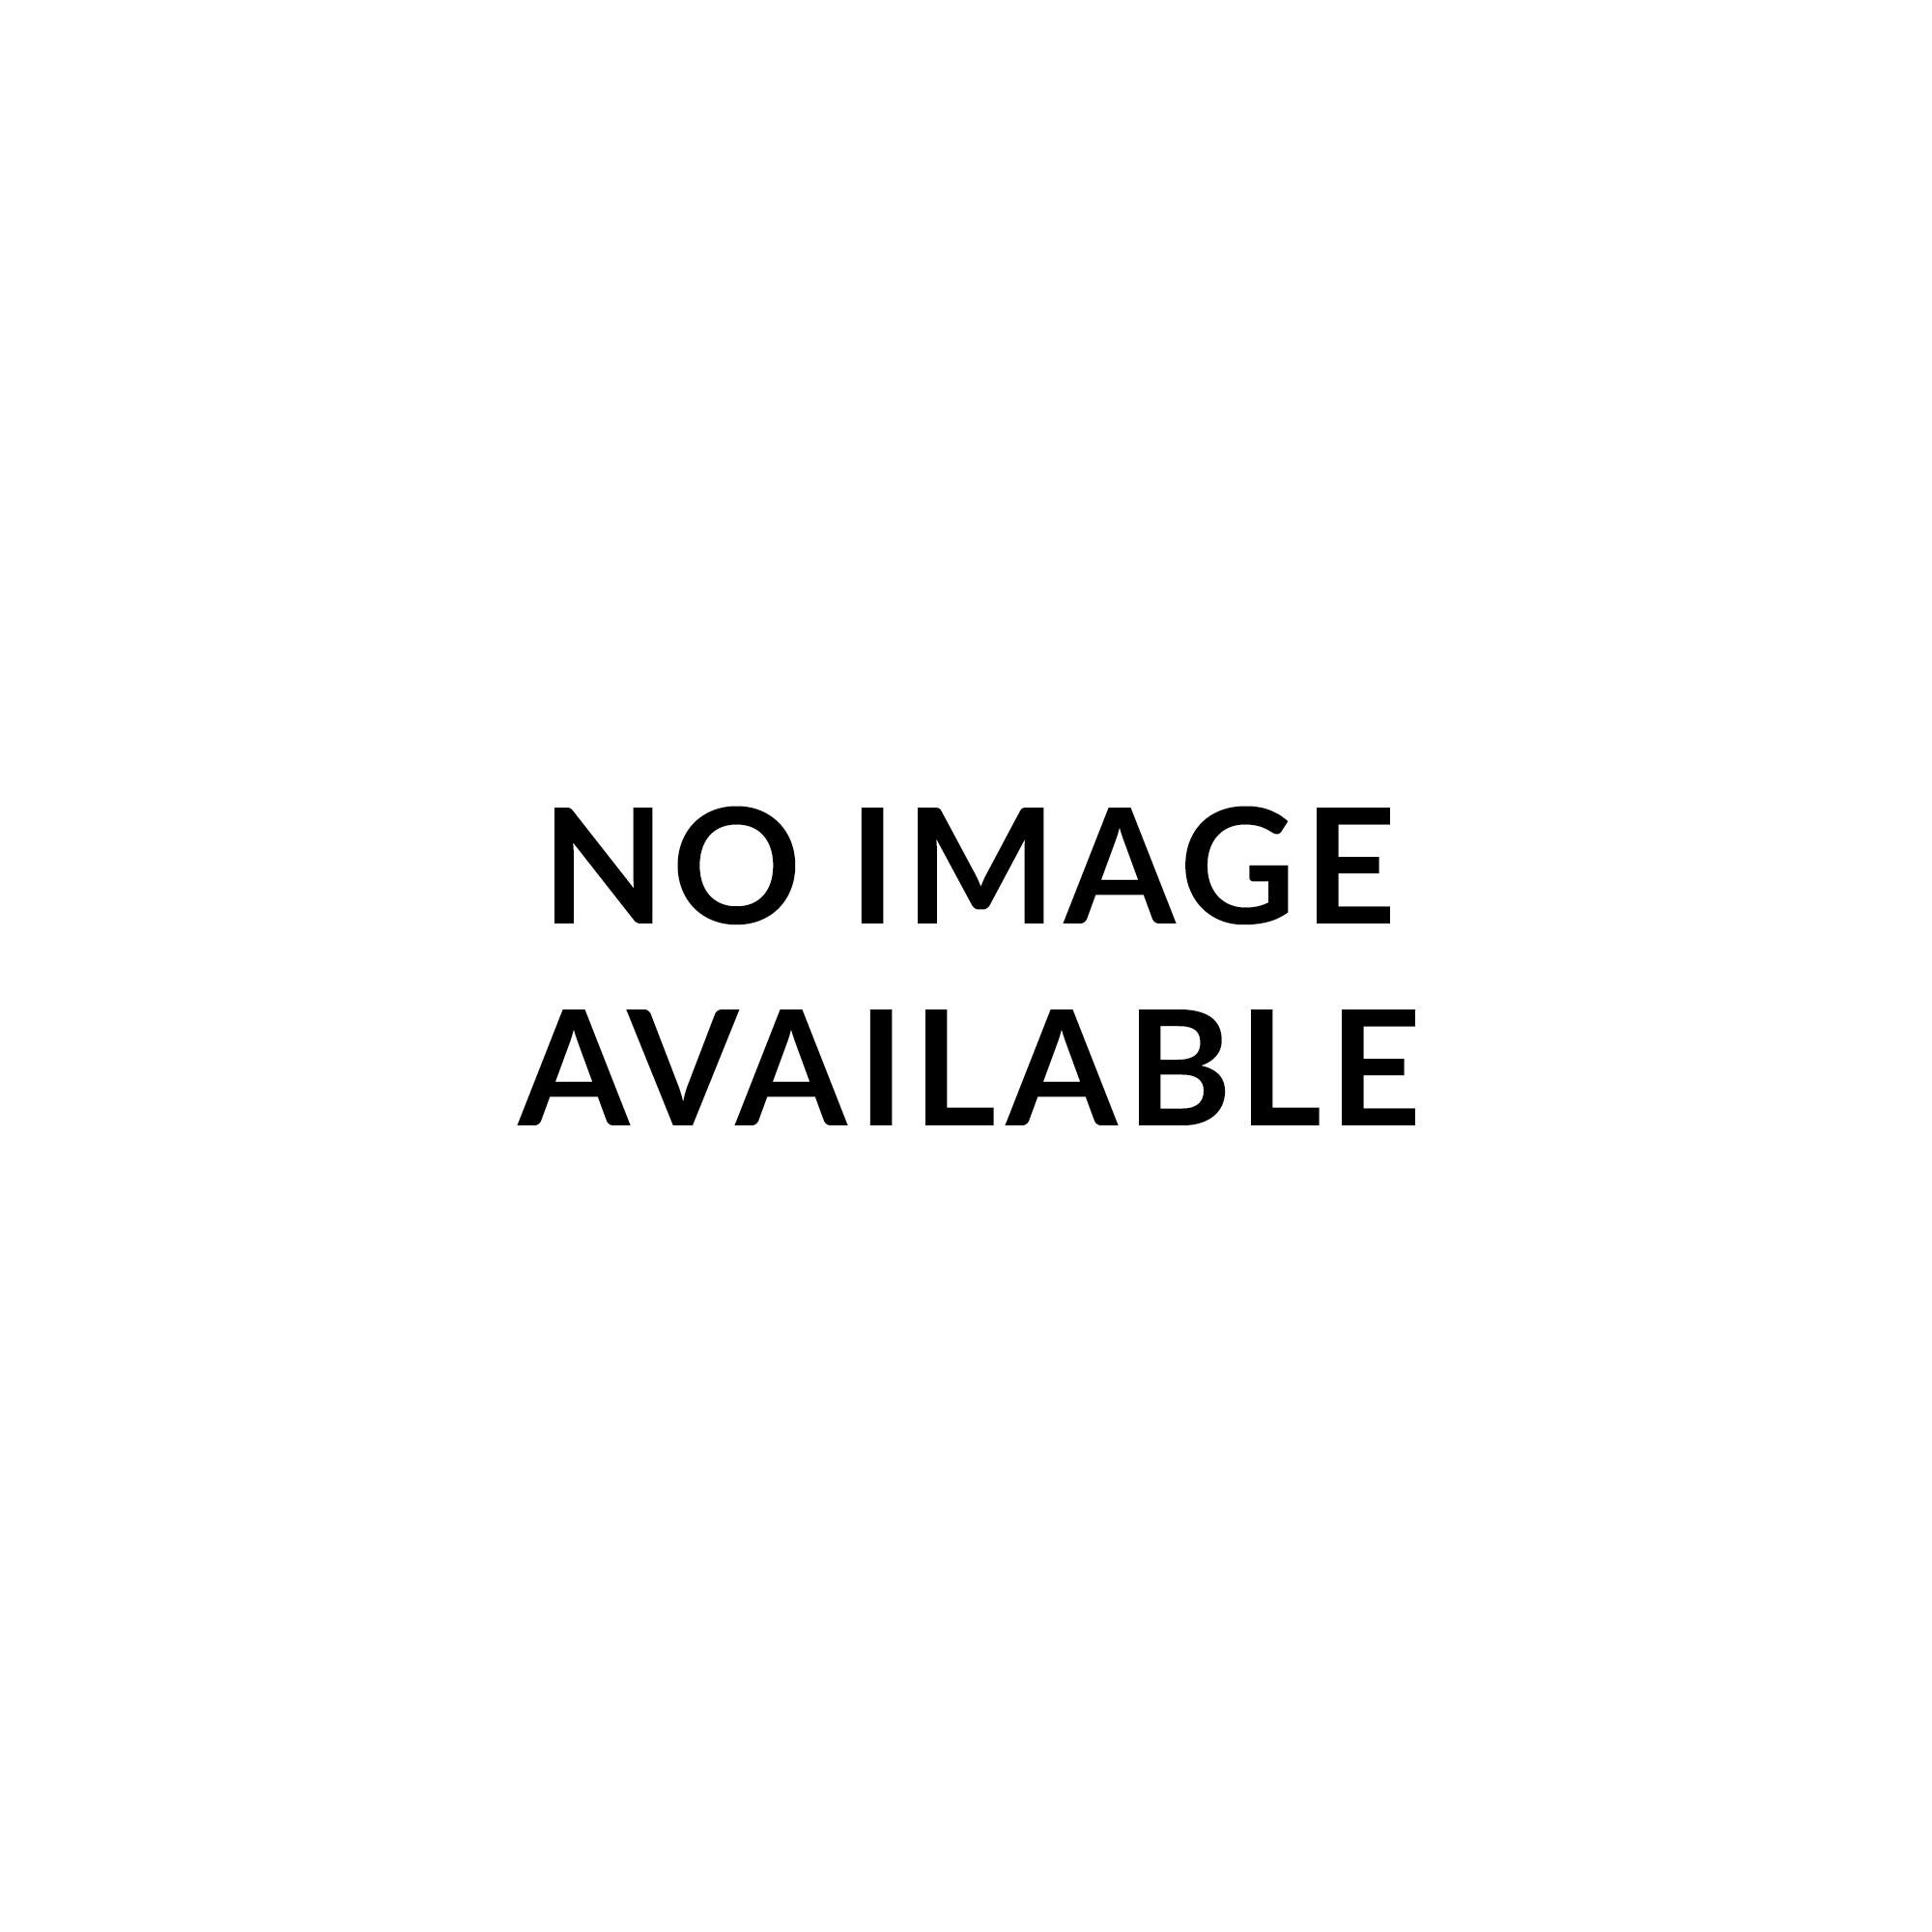 Jim Dunlop 927 LAP DAWG TONEBAR, Chromed Brass, 5.6oz